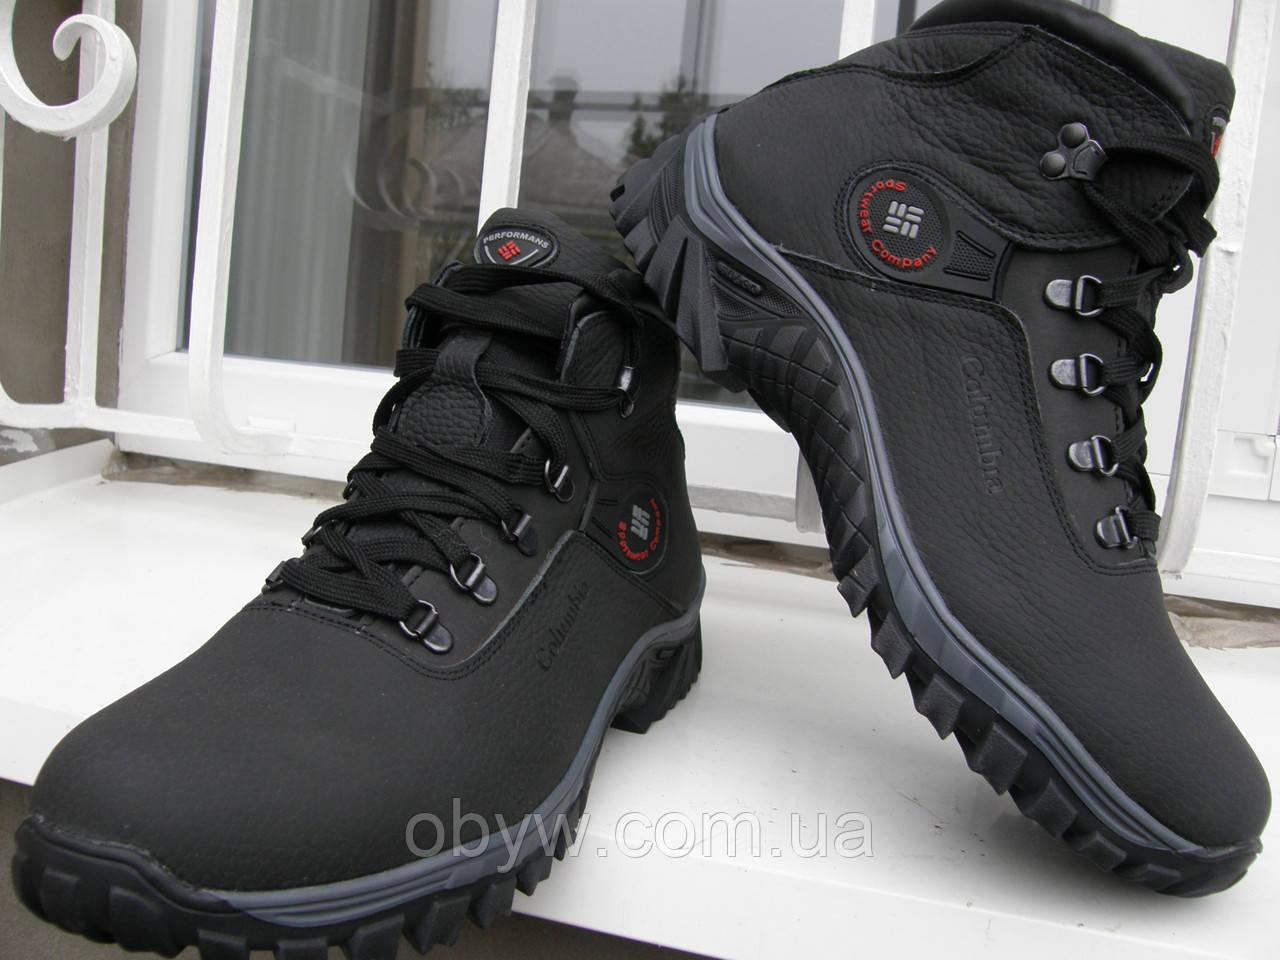 Cаlambia  обувь мужская зима